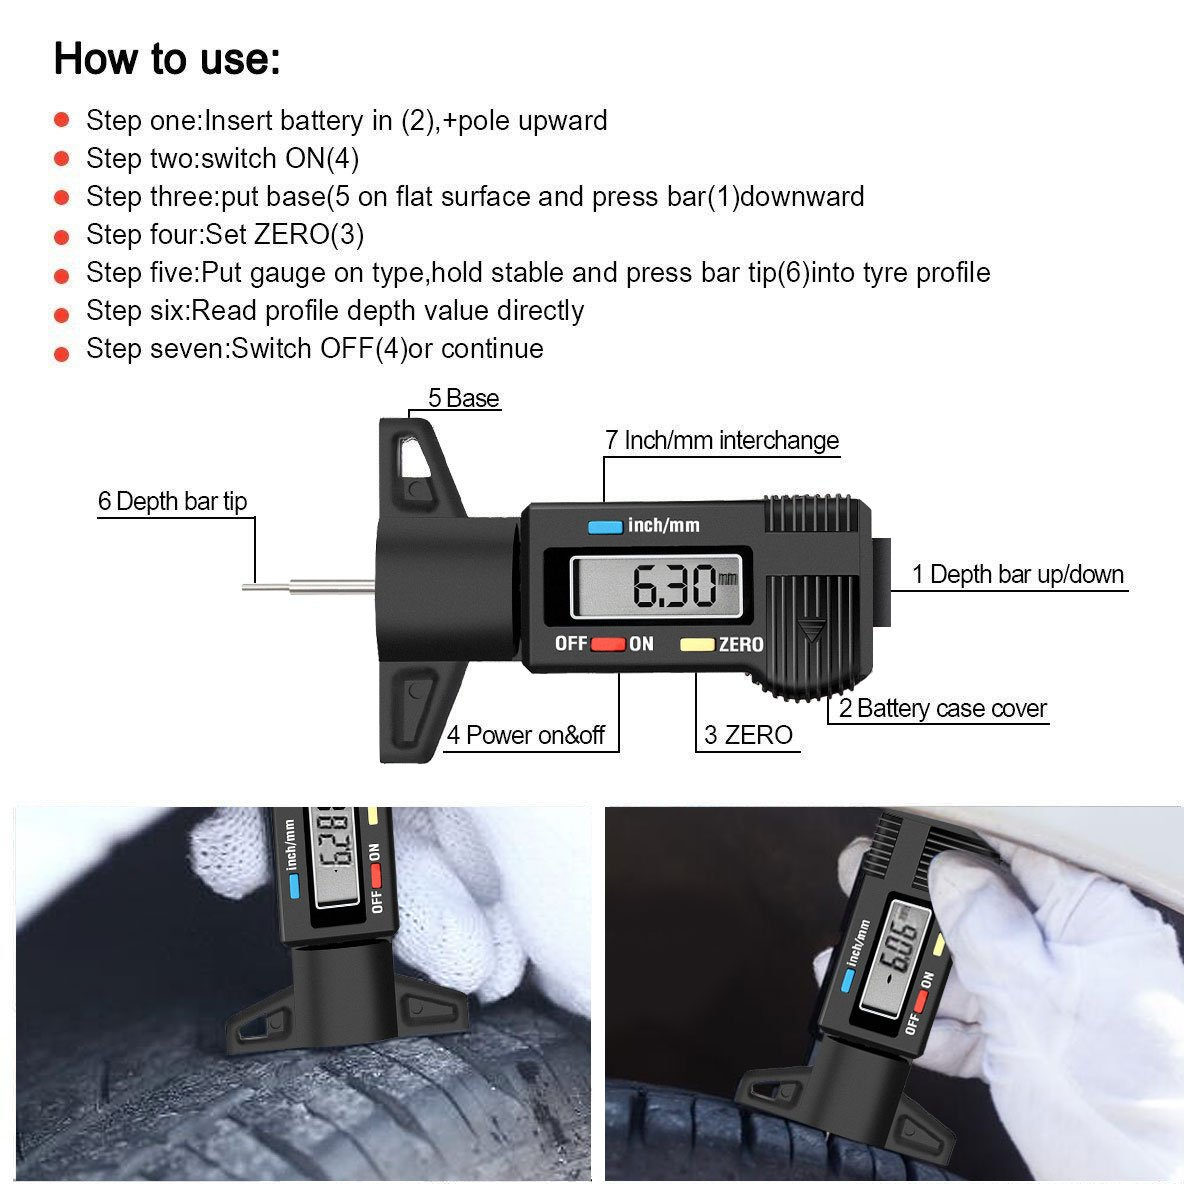 Audew Digital Tire Tread Depth Gauge - Digital Tire Gauge Meter Measurer LCD Display Tread Checker Tire Tester for Cars Trucks Vans SUV, Metric Inch Conversion 0-25.4mm by Audew (Image #8)